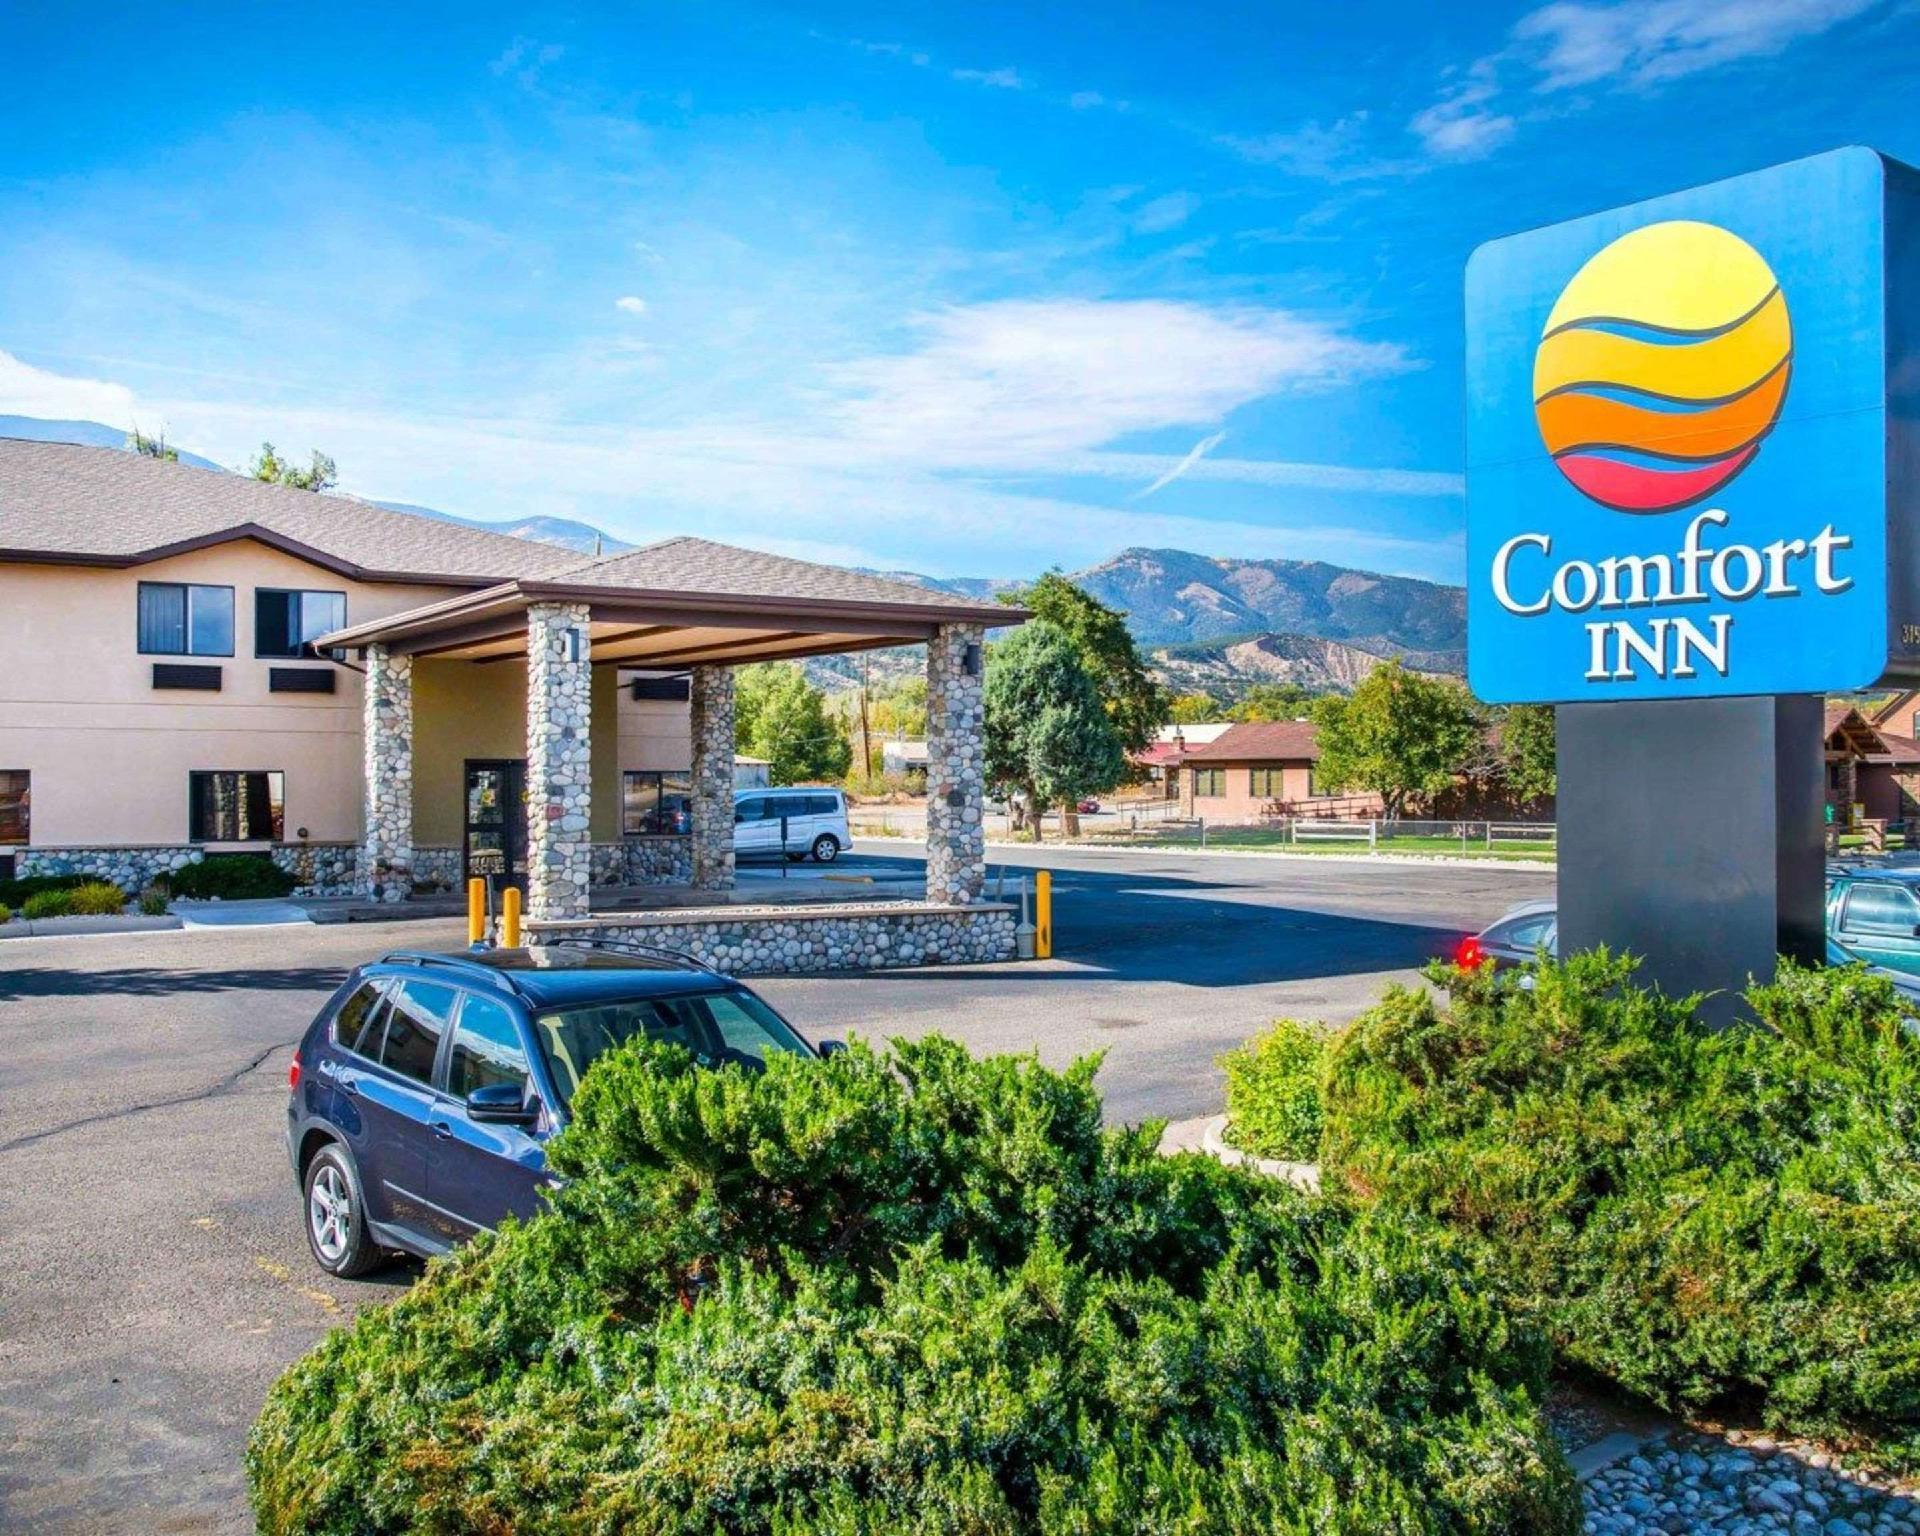 Comfort Inn Salida (CO) United States